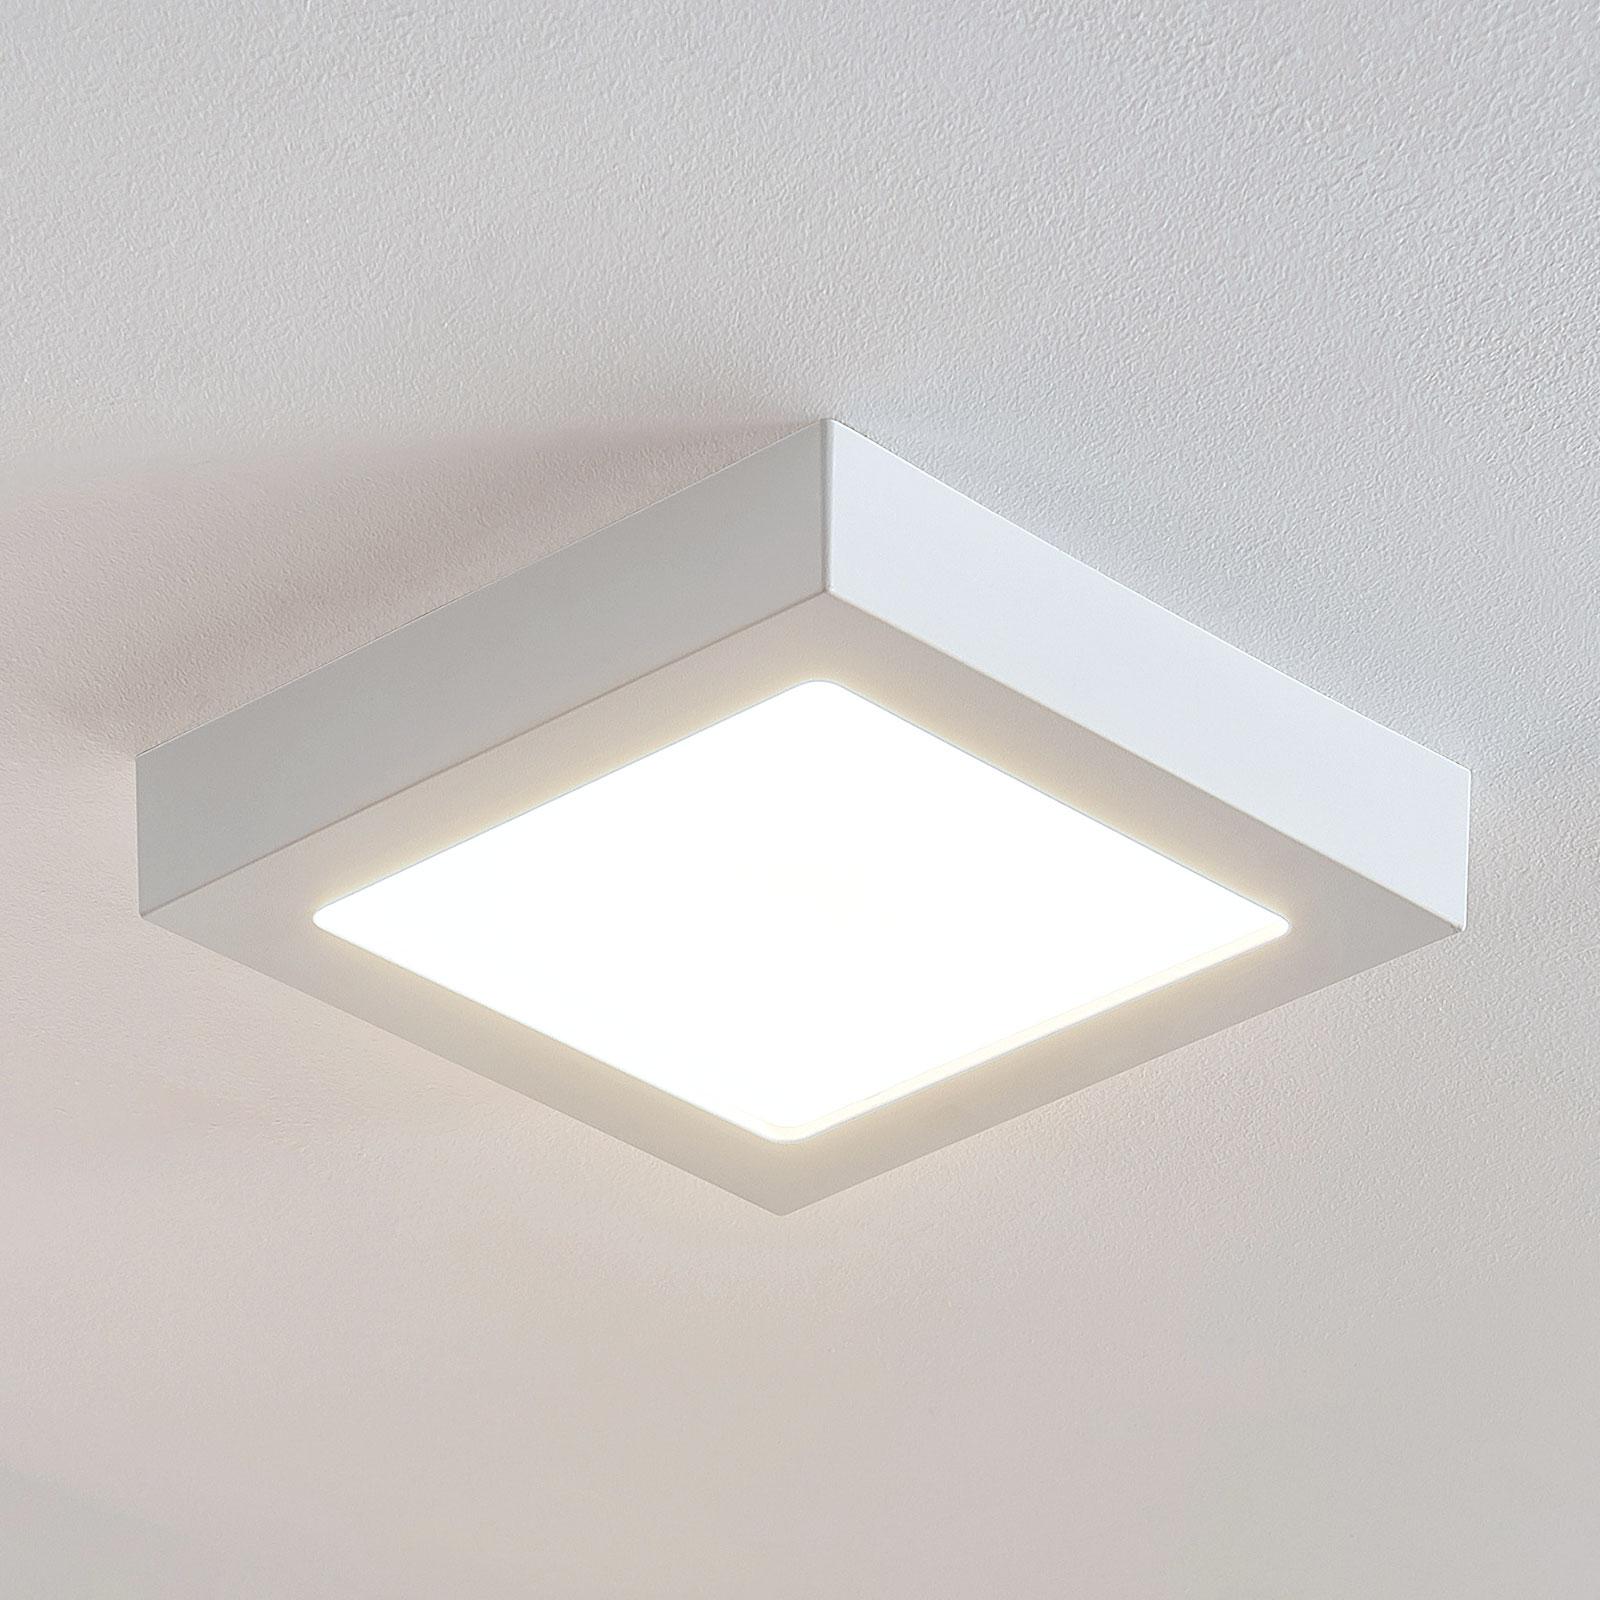 LED-Deckenlampe Marlo weiß 3000K eckig 23,1cm